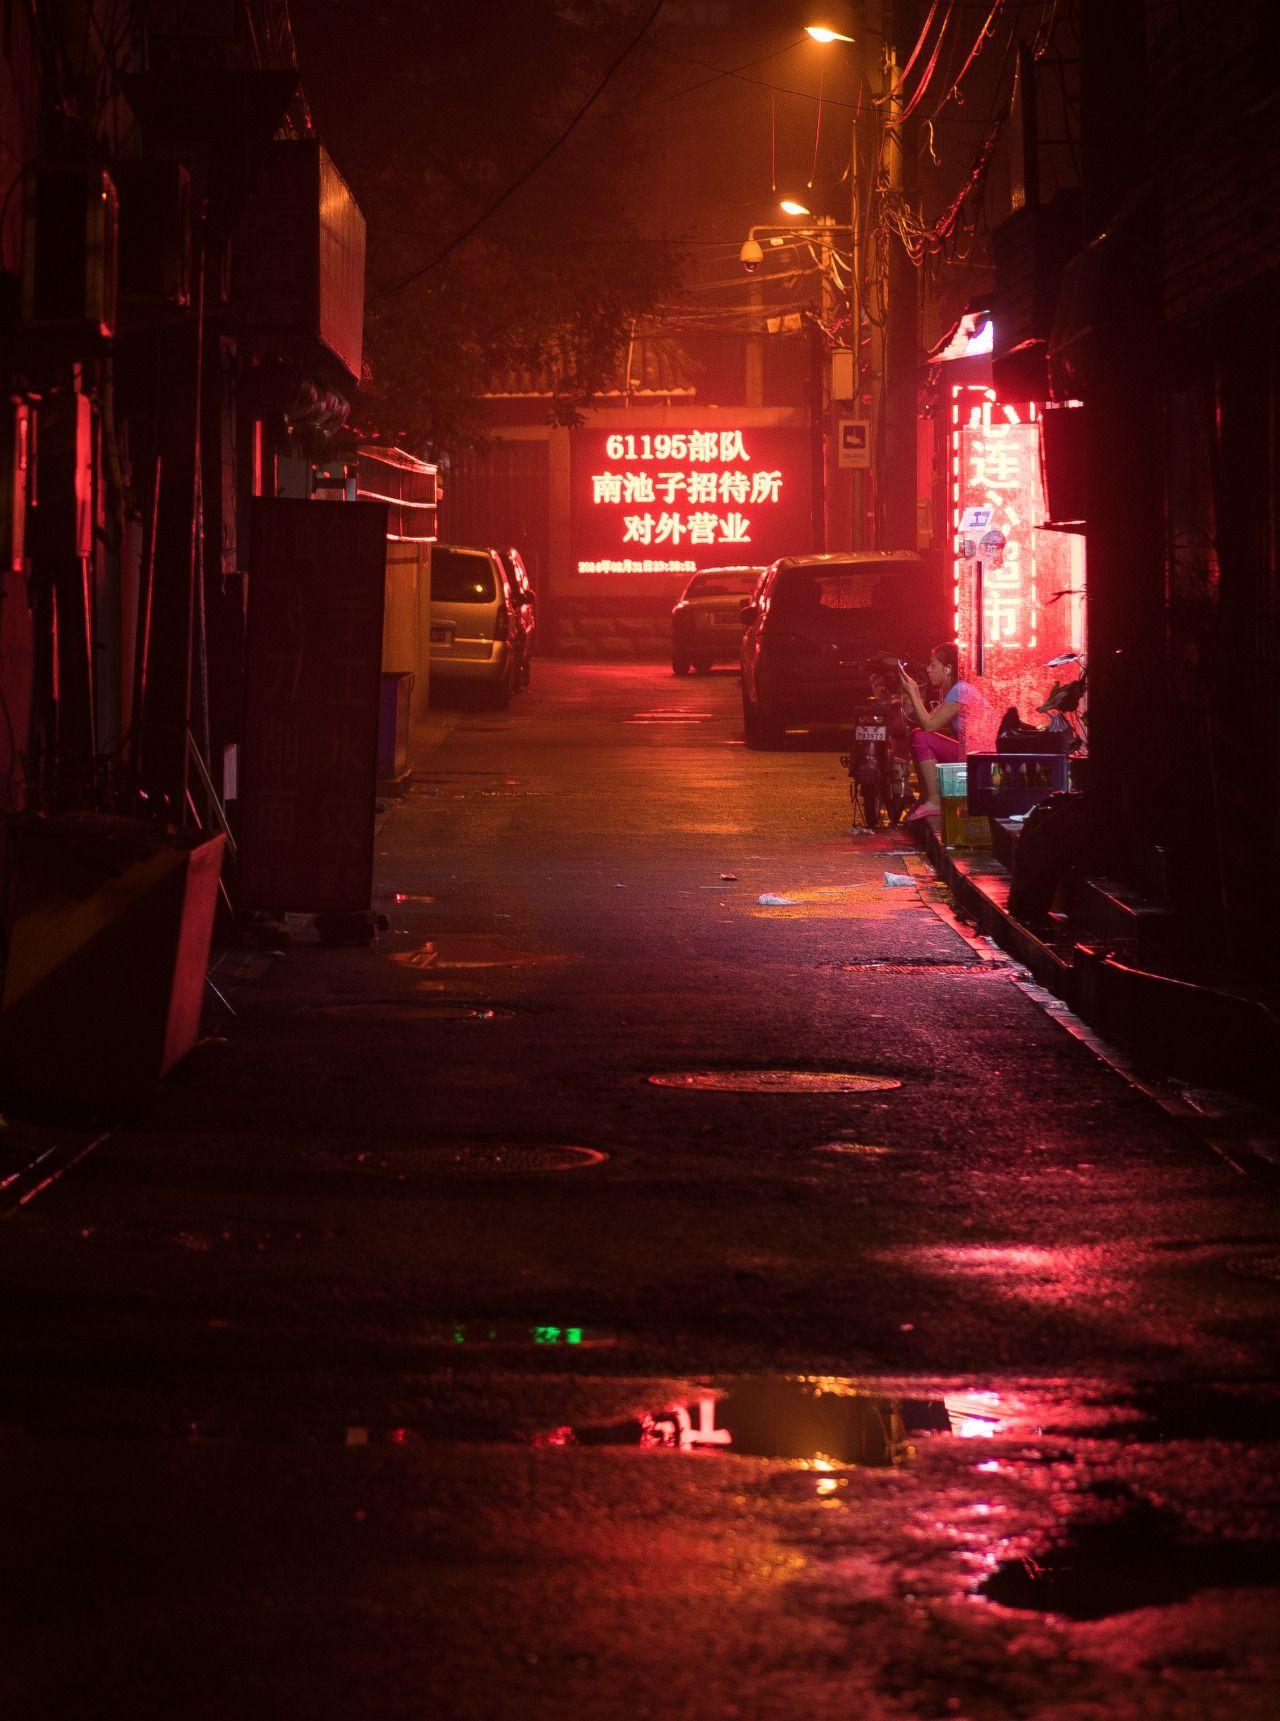 Red Aesthetic Wallpaper Neon